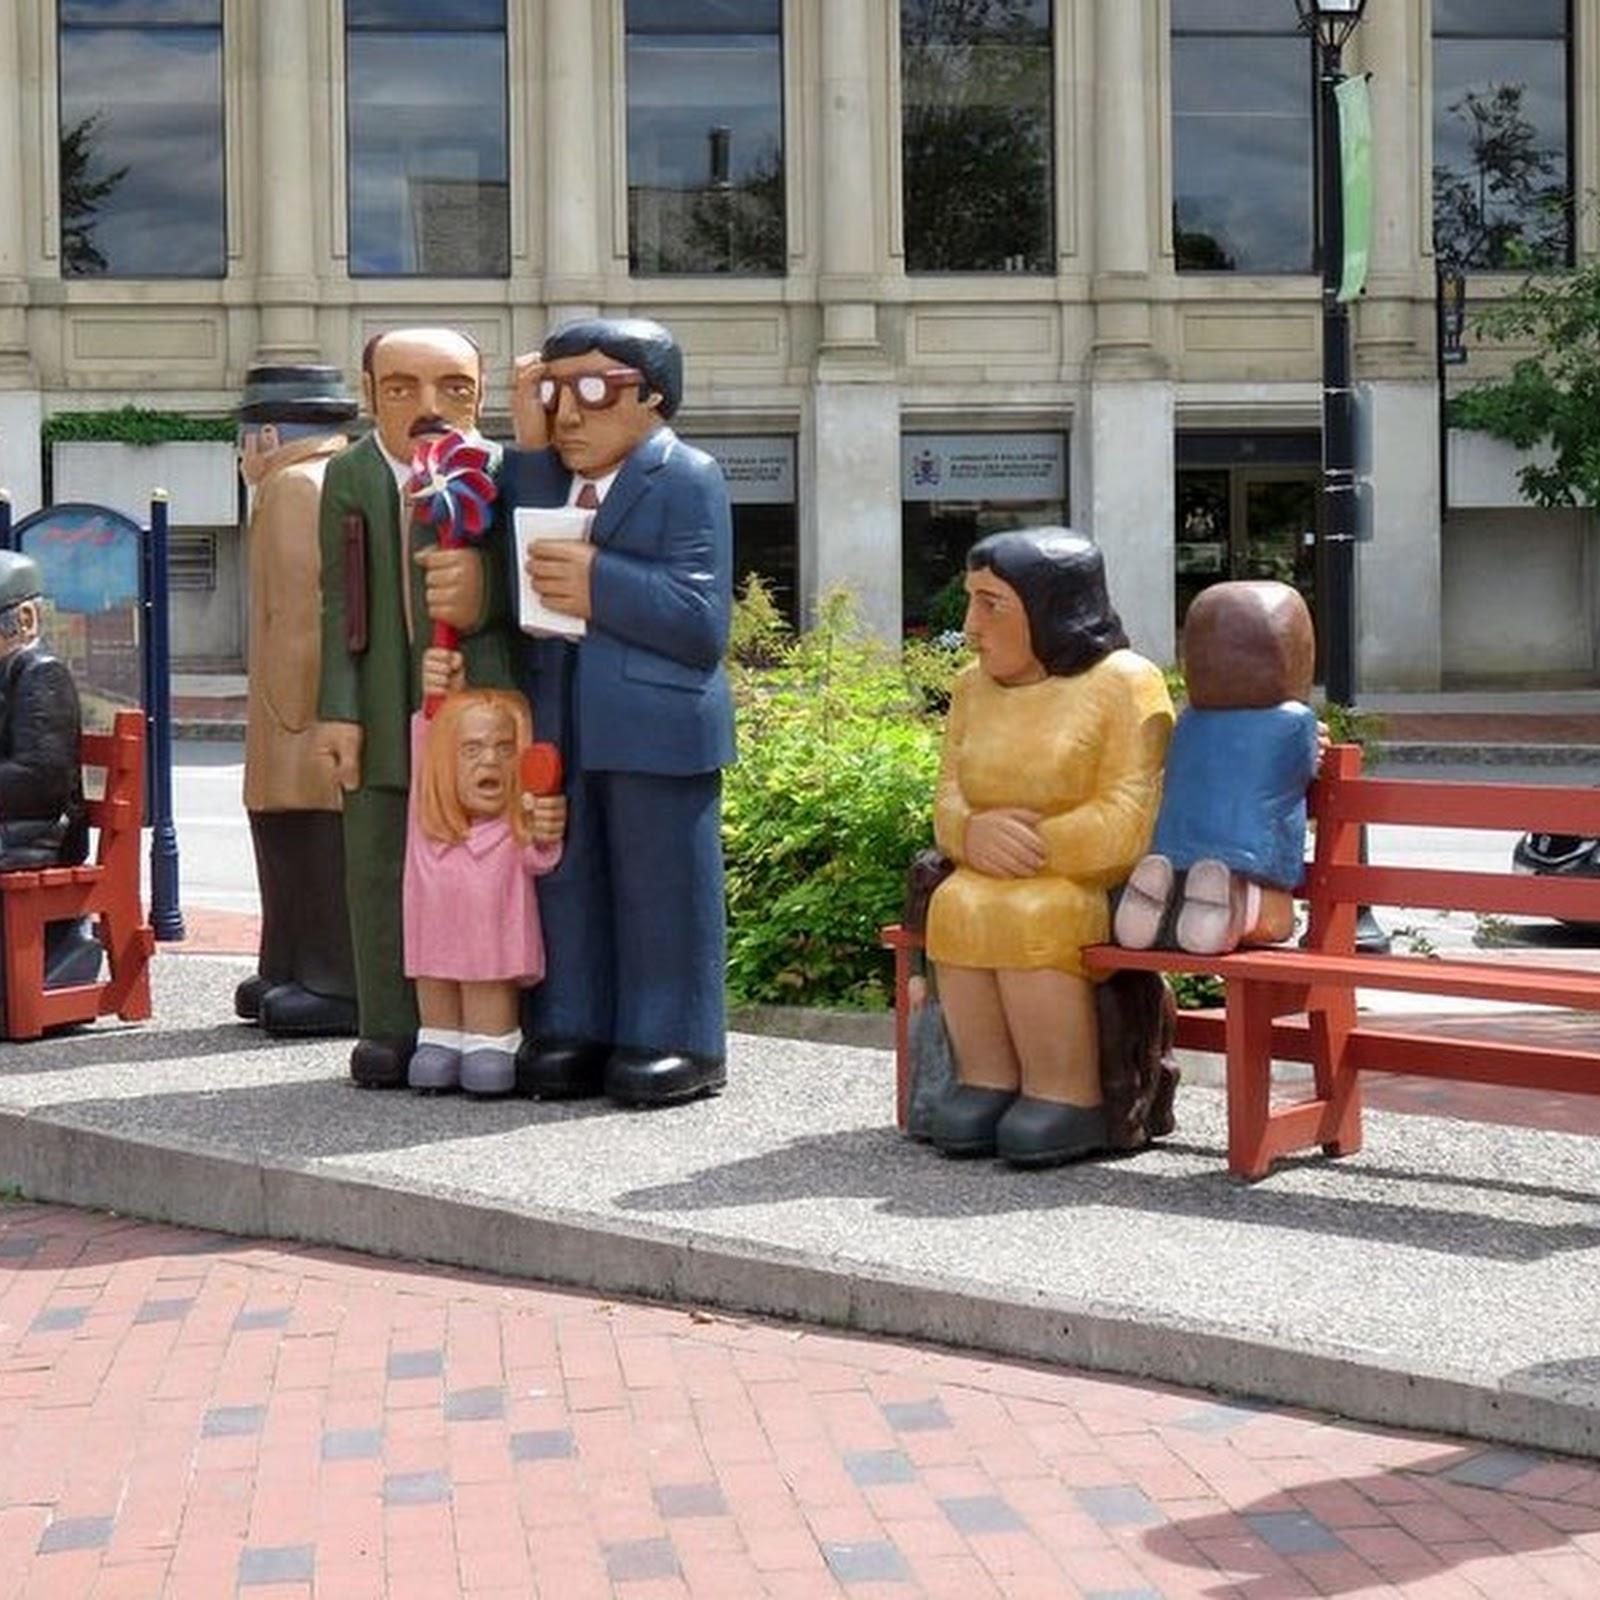 John Hooper's Public Art And Sculptures